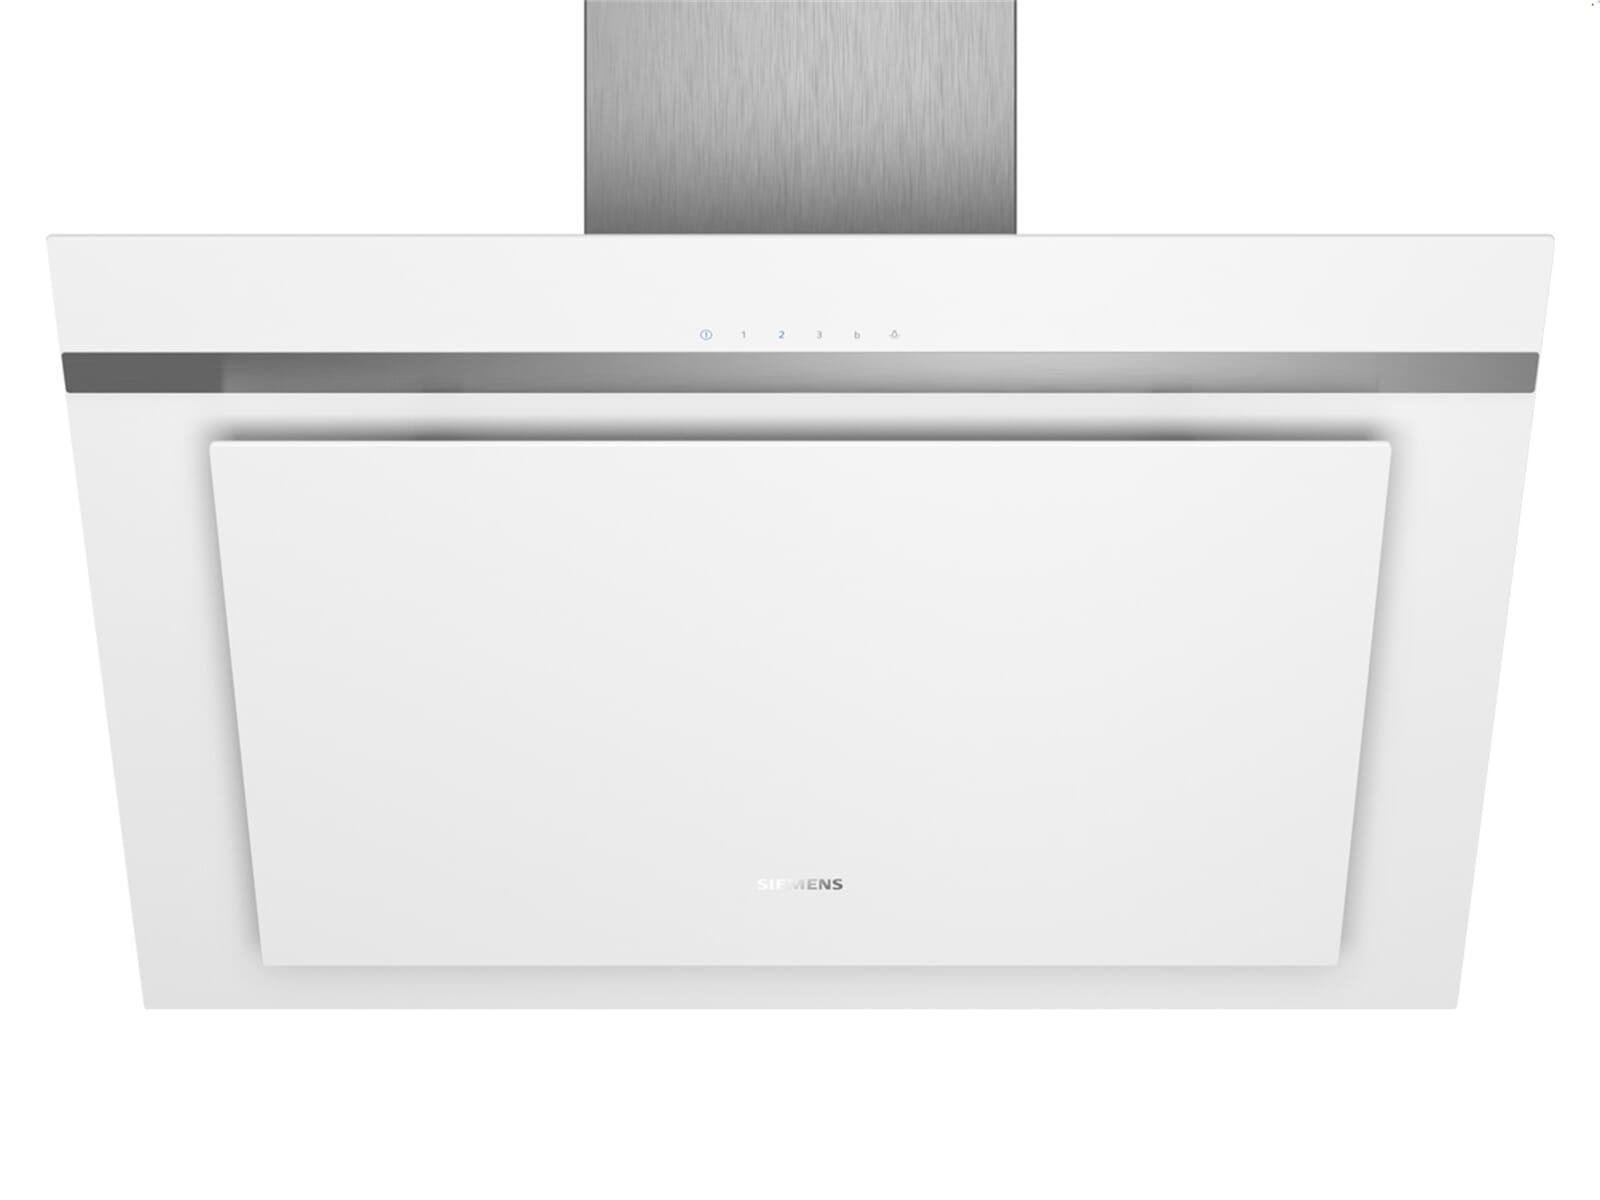 Siemens lc87khm20 kopffreihaube weiß